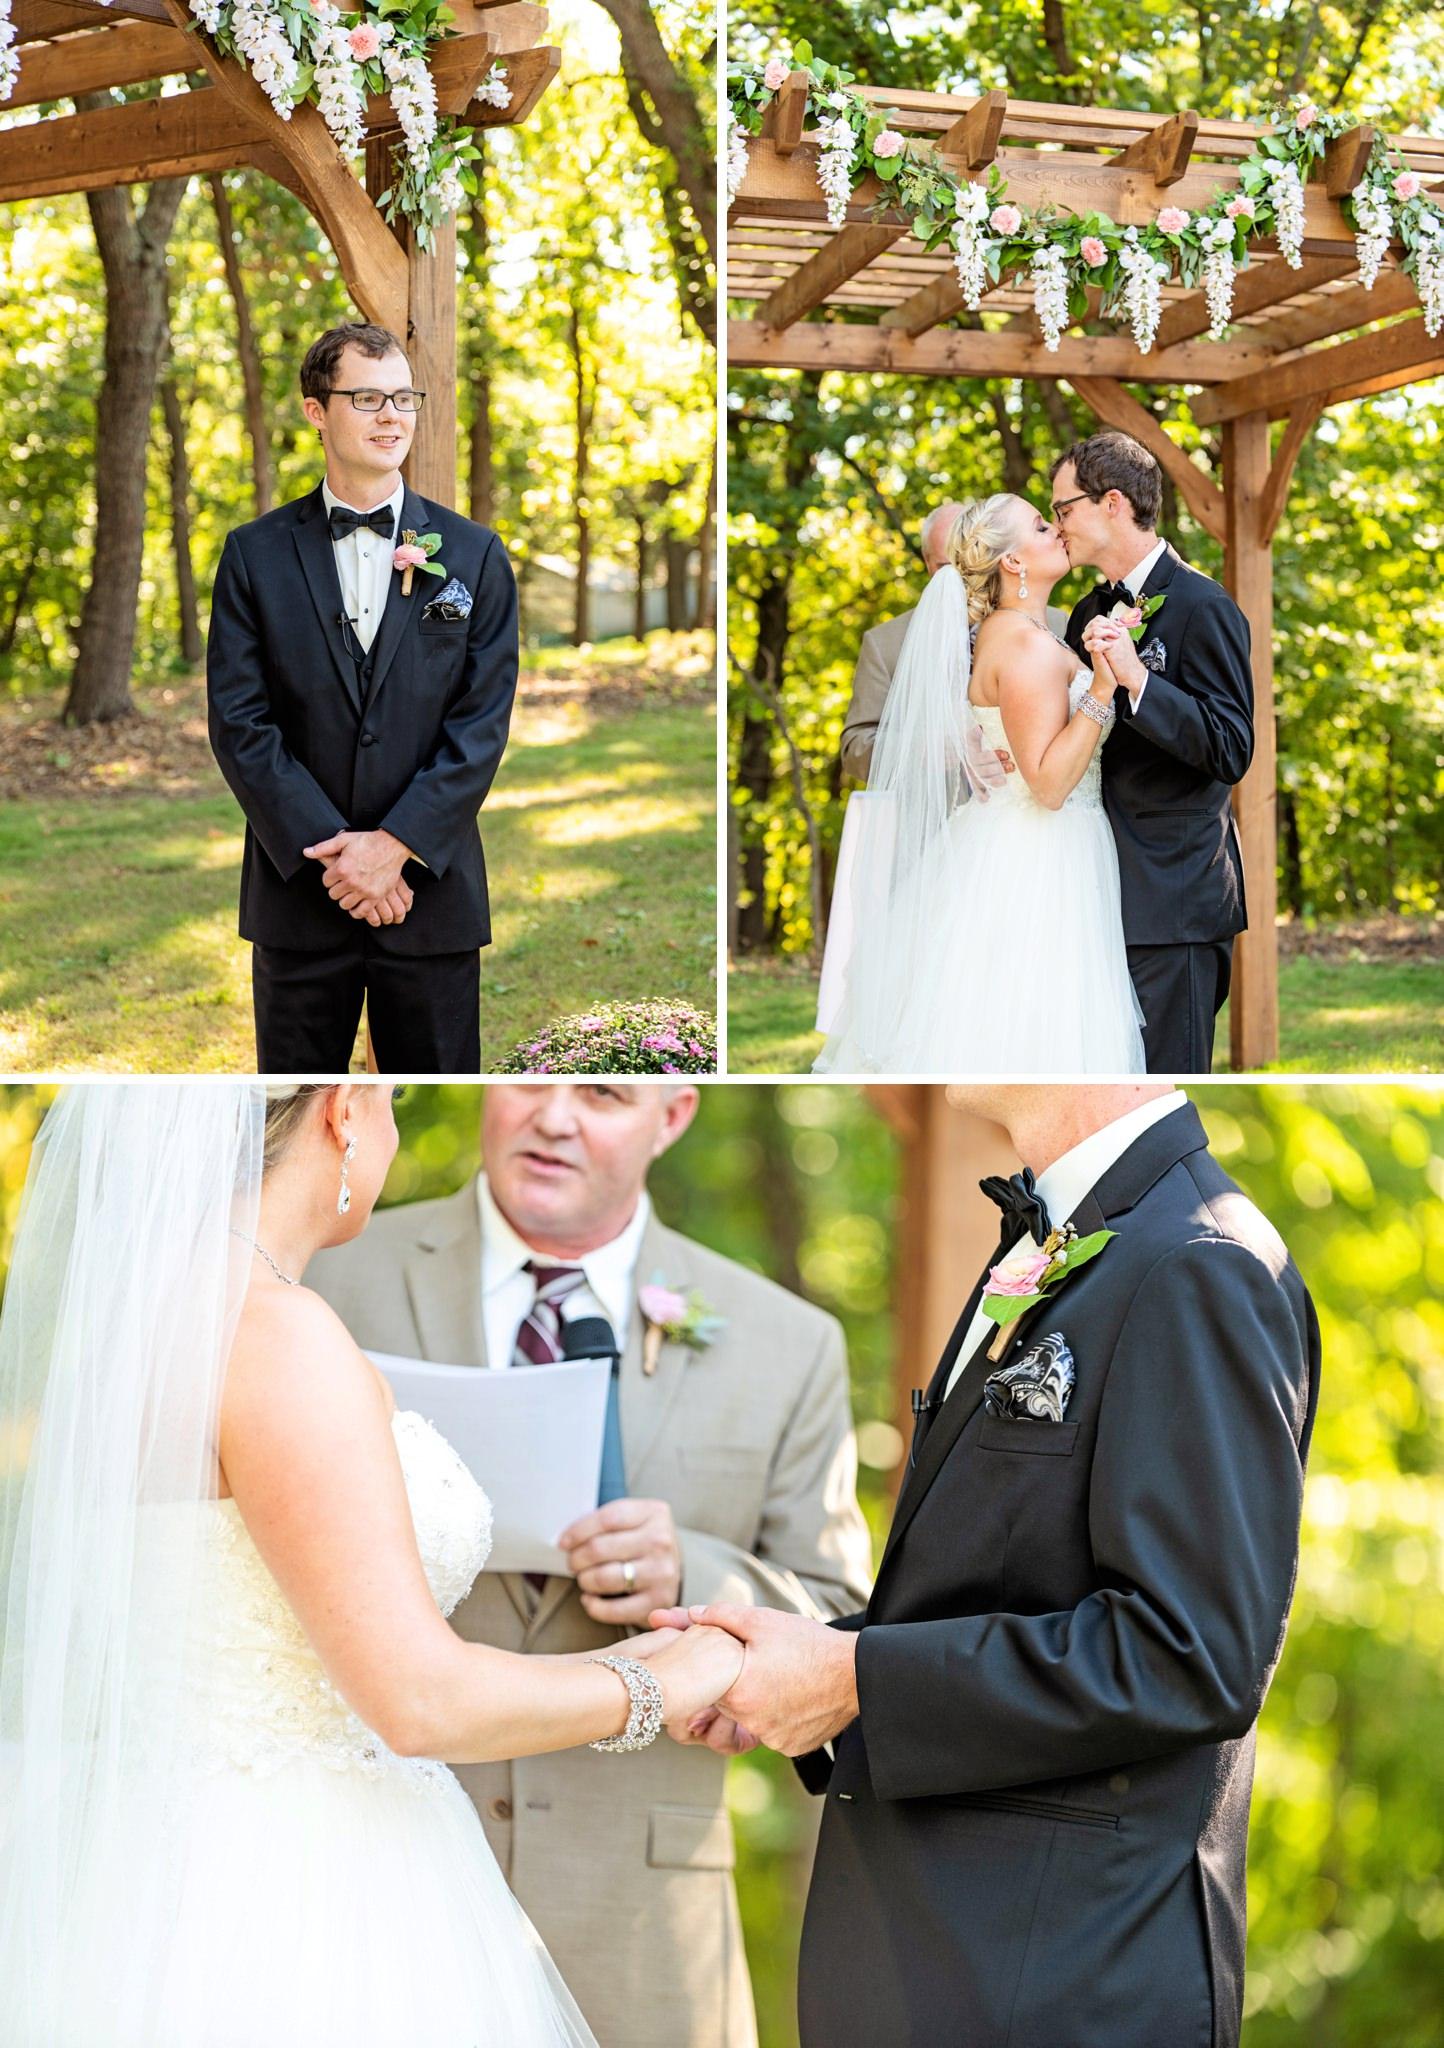 Brittany-Jay-Wedding-091518-Rotella-Photography-12_BLOG.jpg